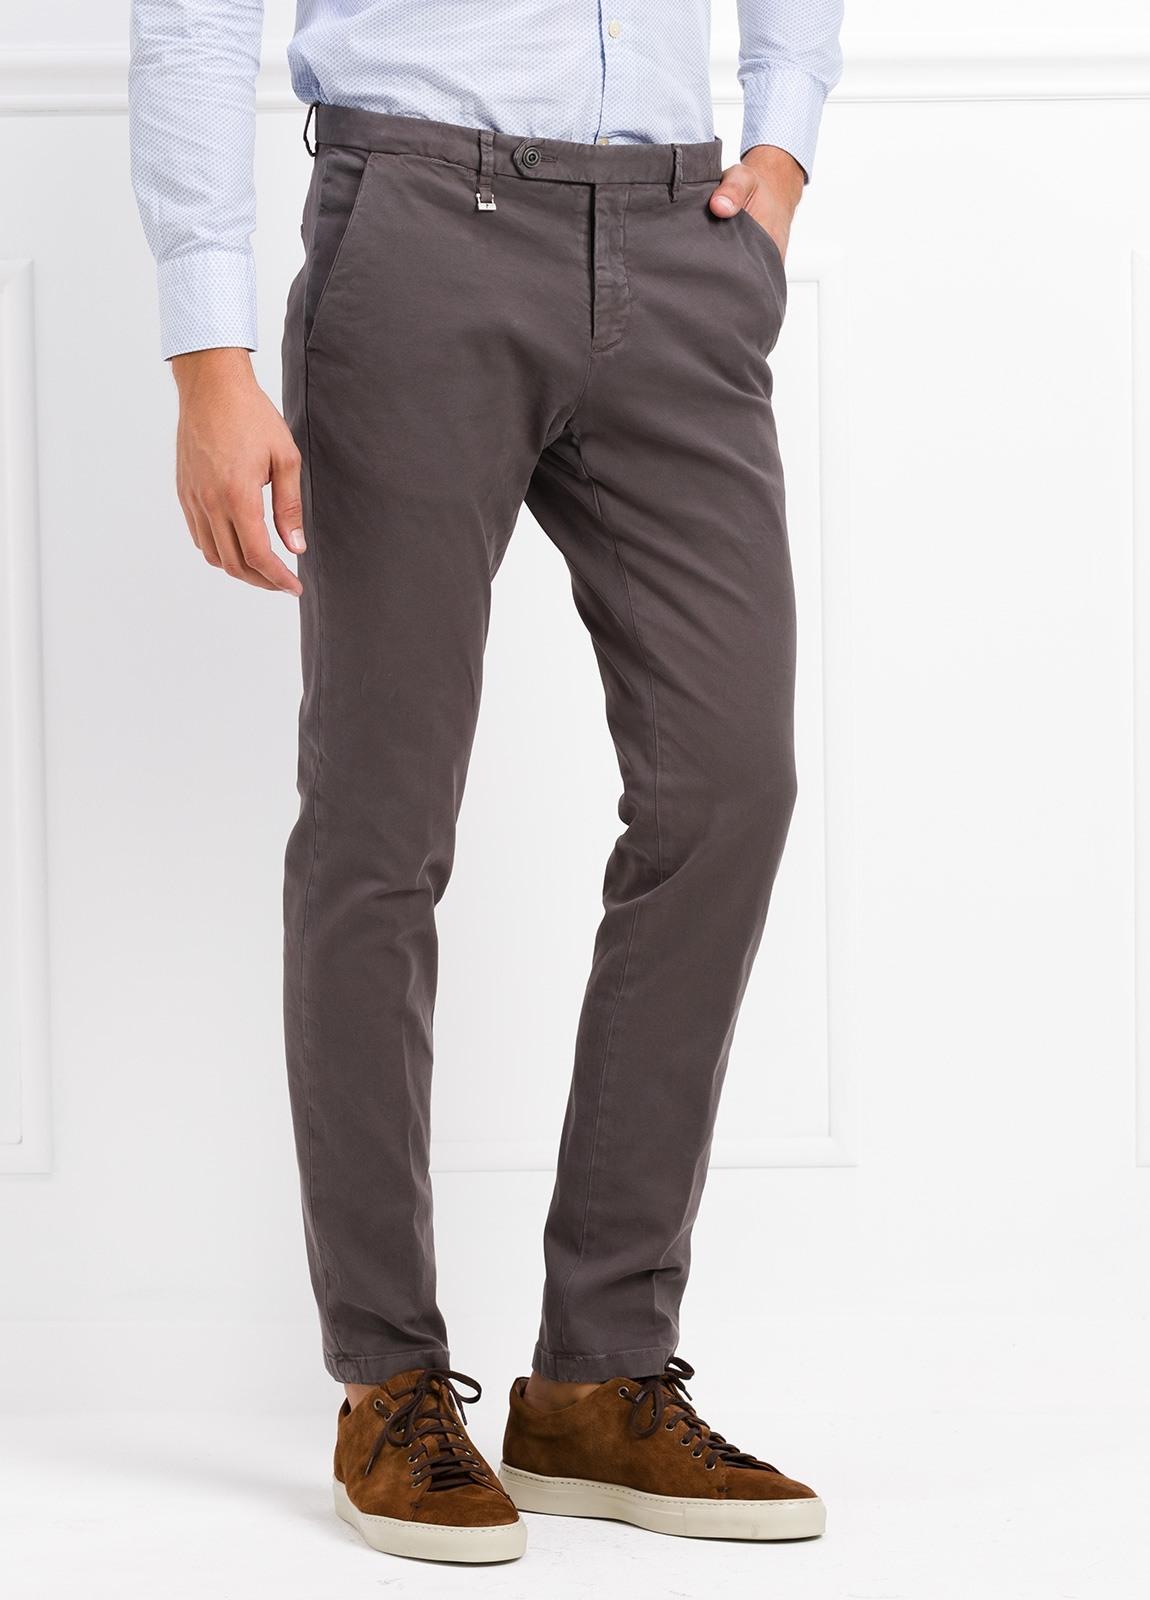 Pantalón modelo slim fit color gris. 97% Algodón 3% Ea. - Ítem1